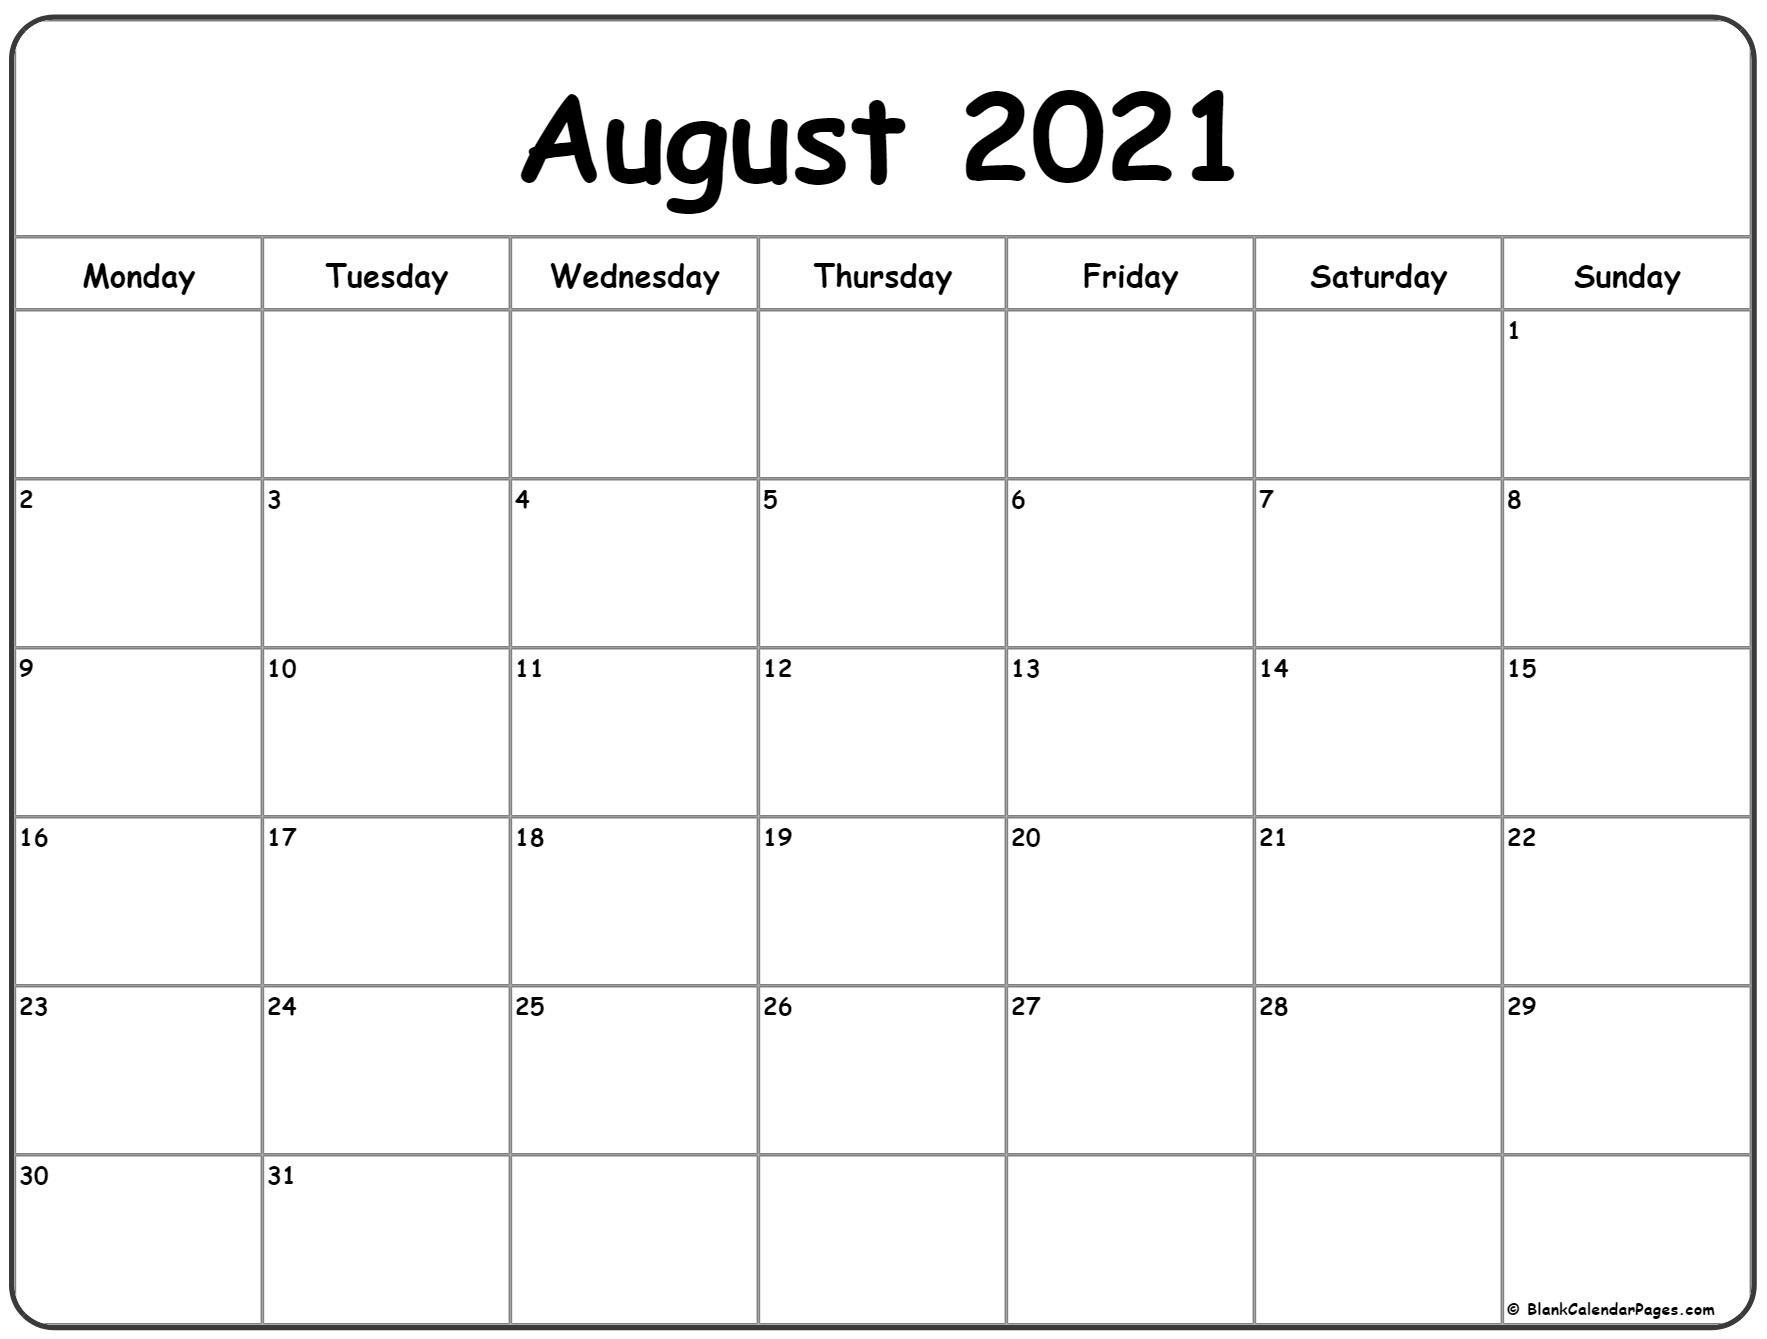 August 2021 Monday Calendar | Monday To Sunday  Calendar 2021 August To December